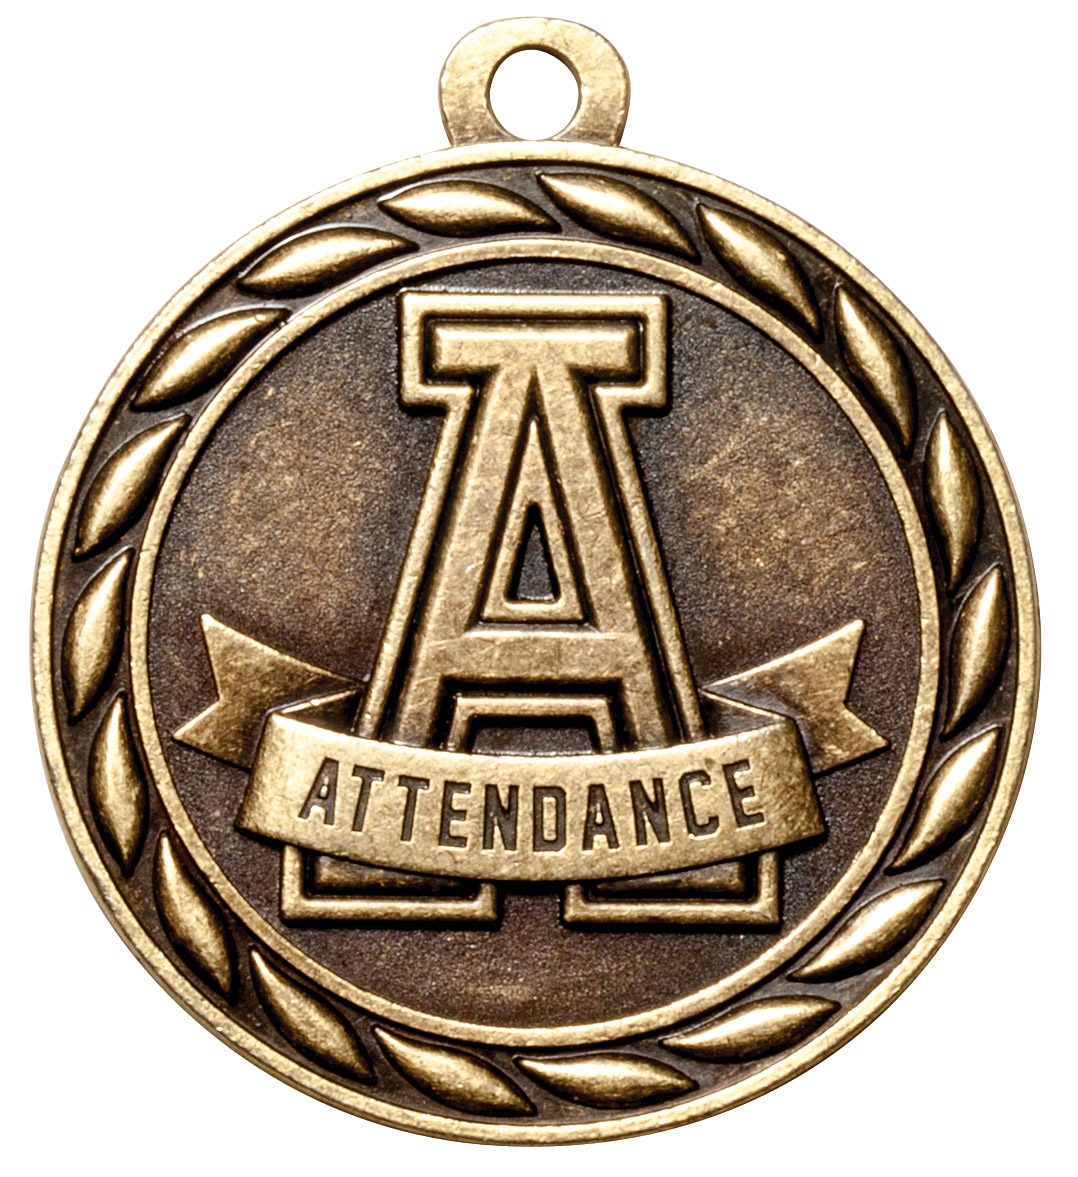 M302-MS - Attendance